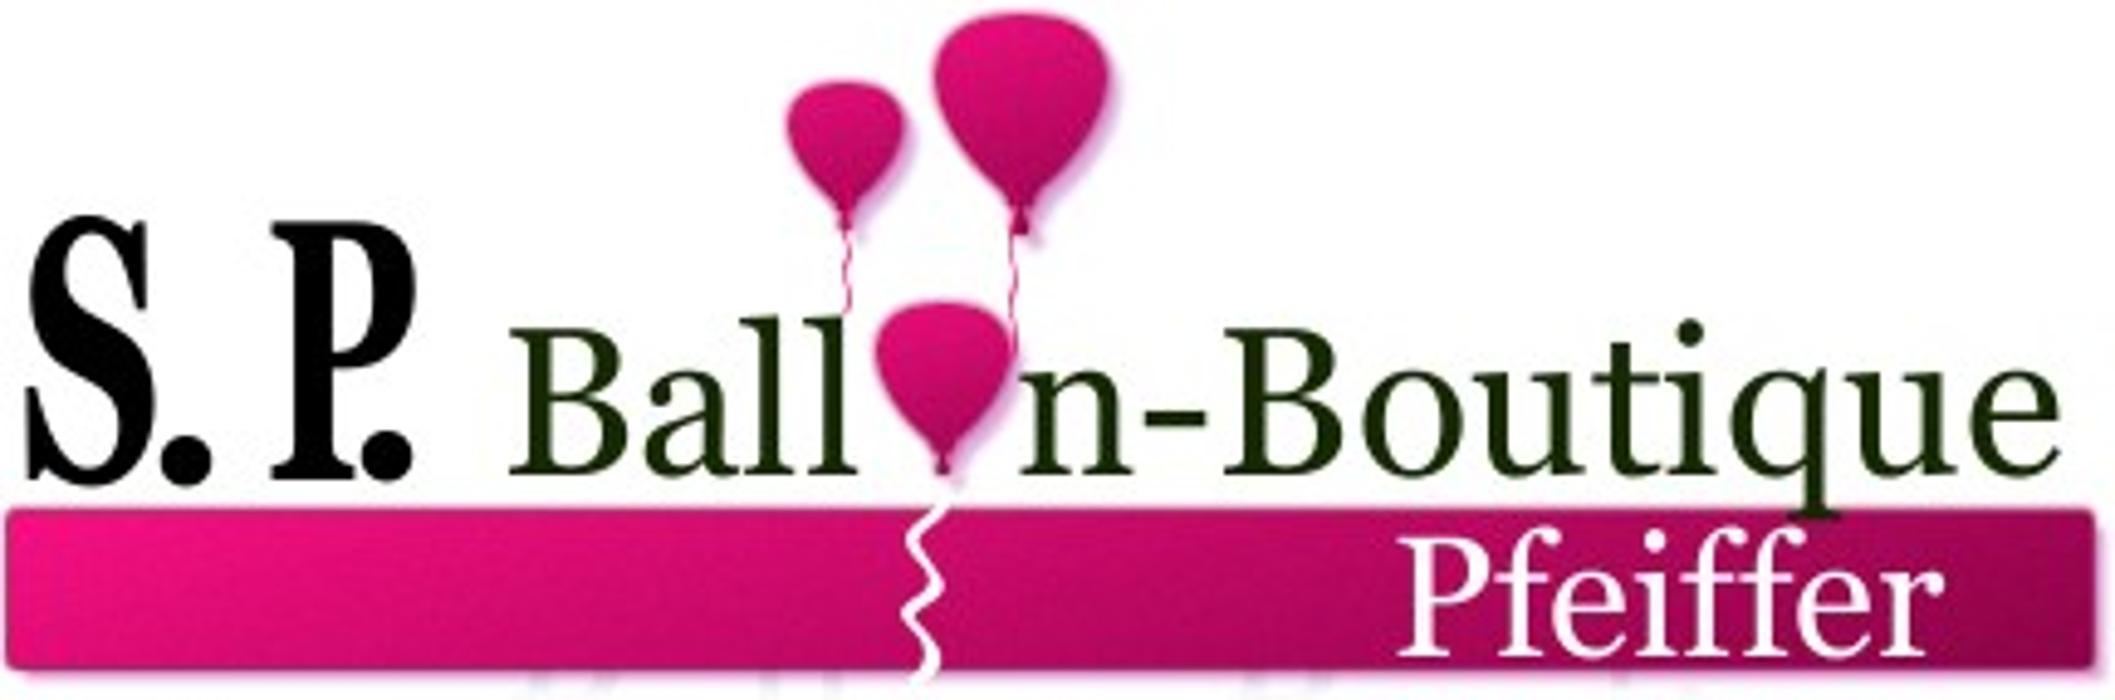 Bild zu Ballon Boutique Pfeiffer in Kalkar